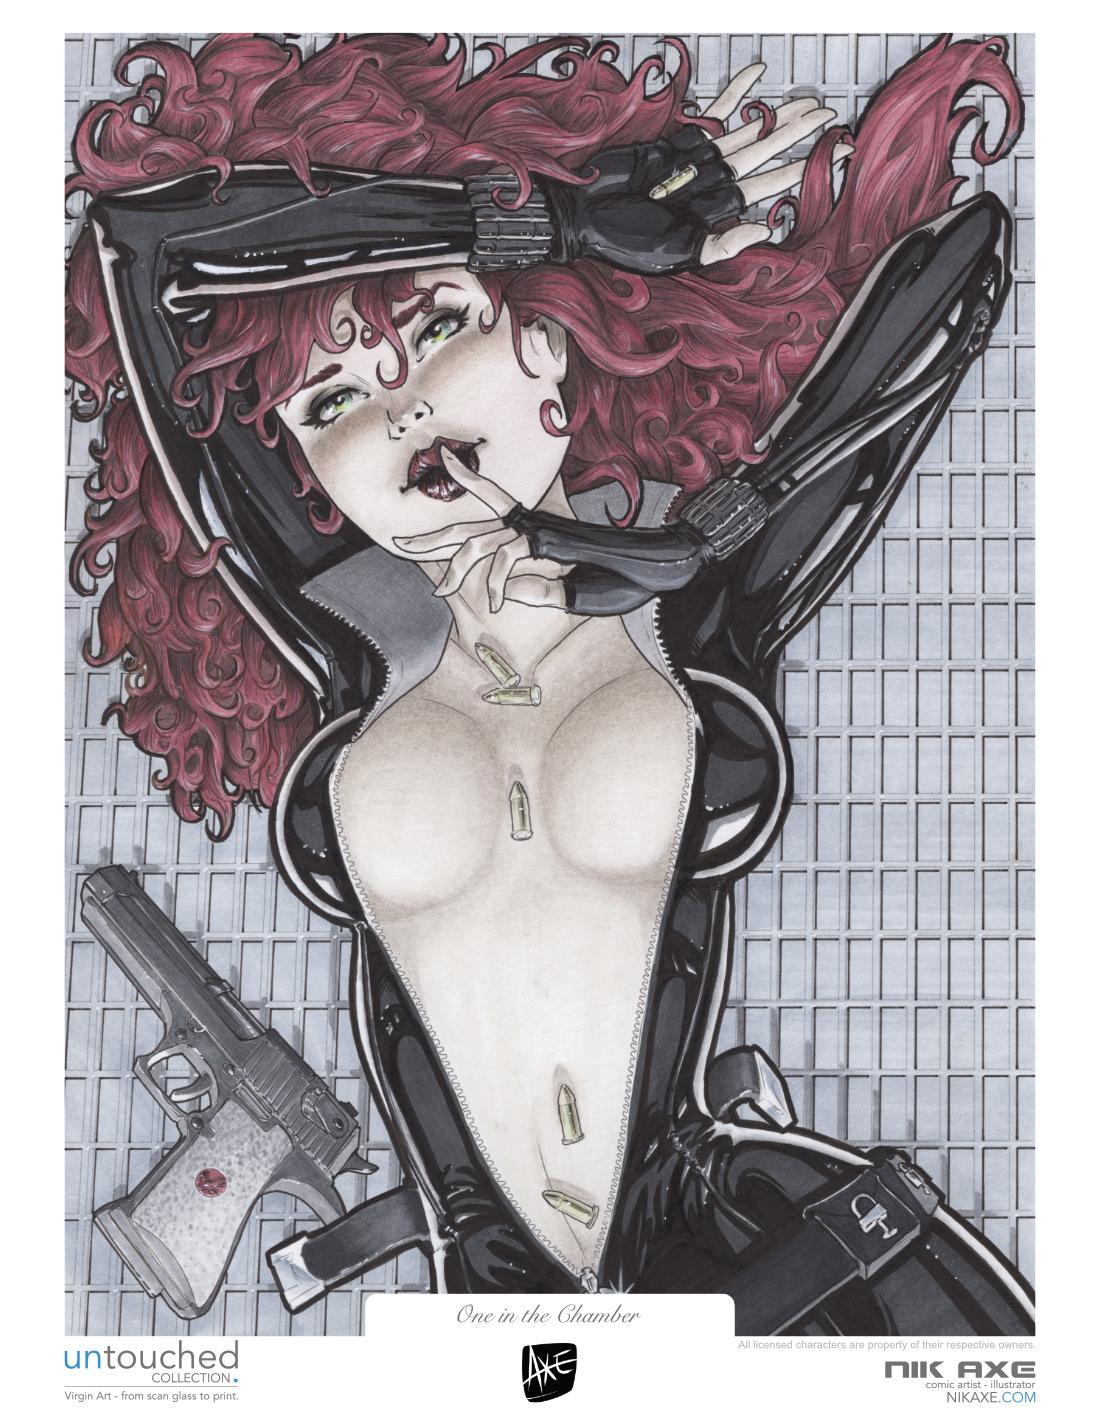 Black Widow Art Print Avengers Marvel Comics One in the Chamber